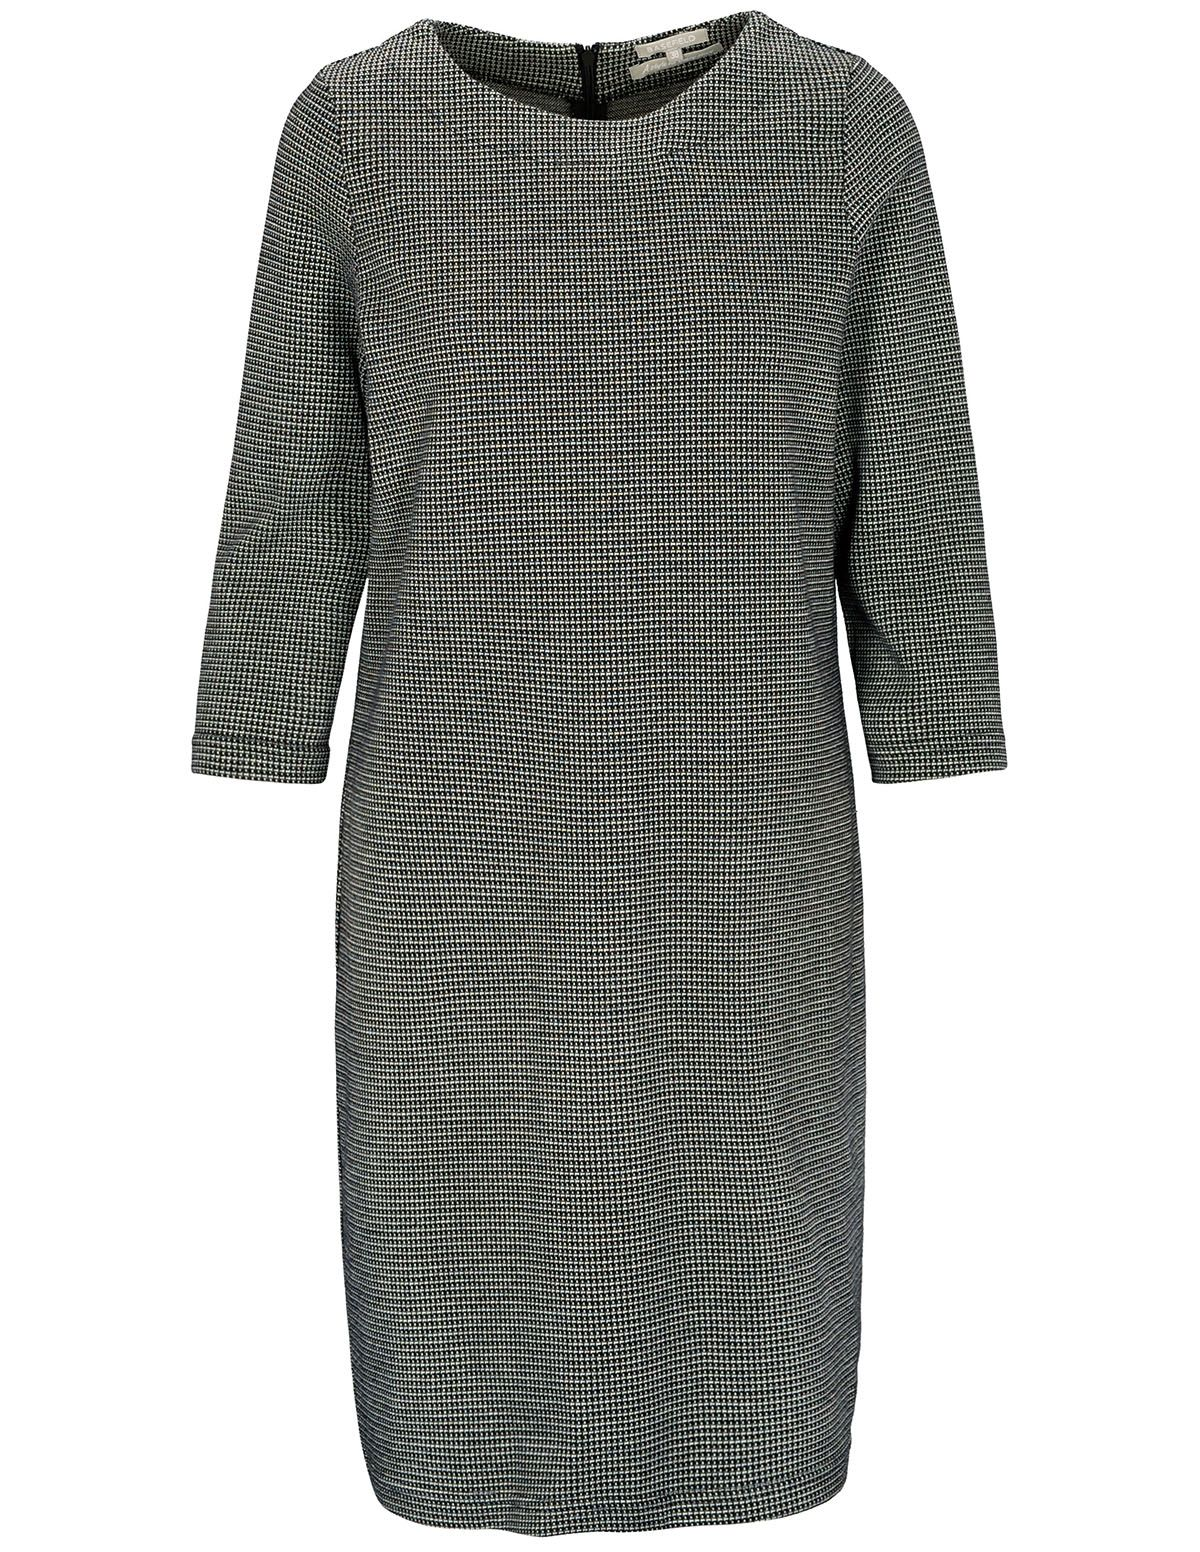 Kleid mit 3/4 Arm - Black White